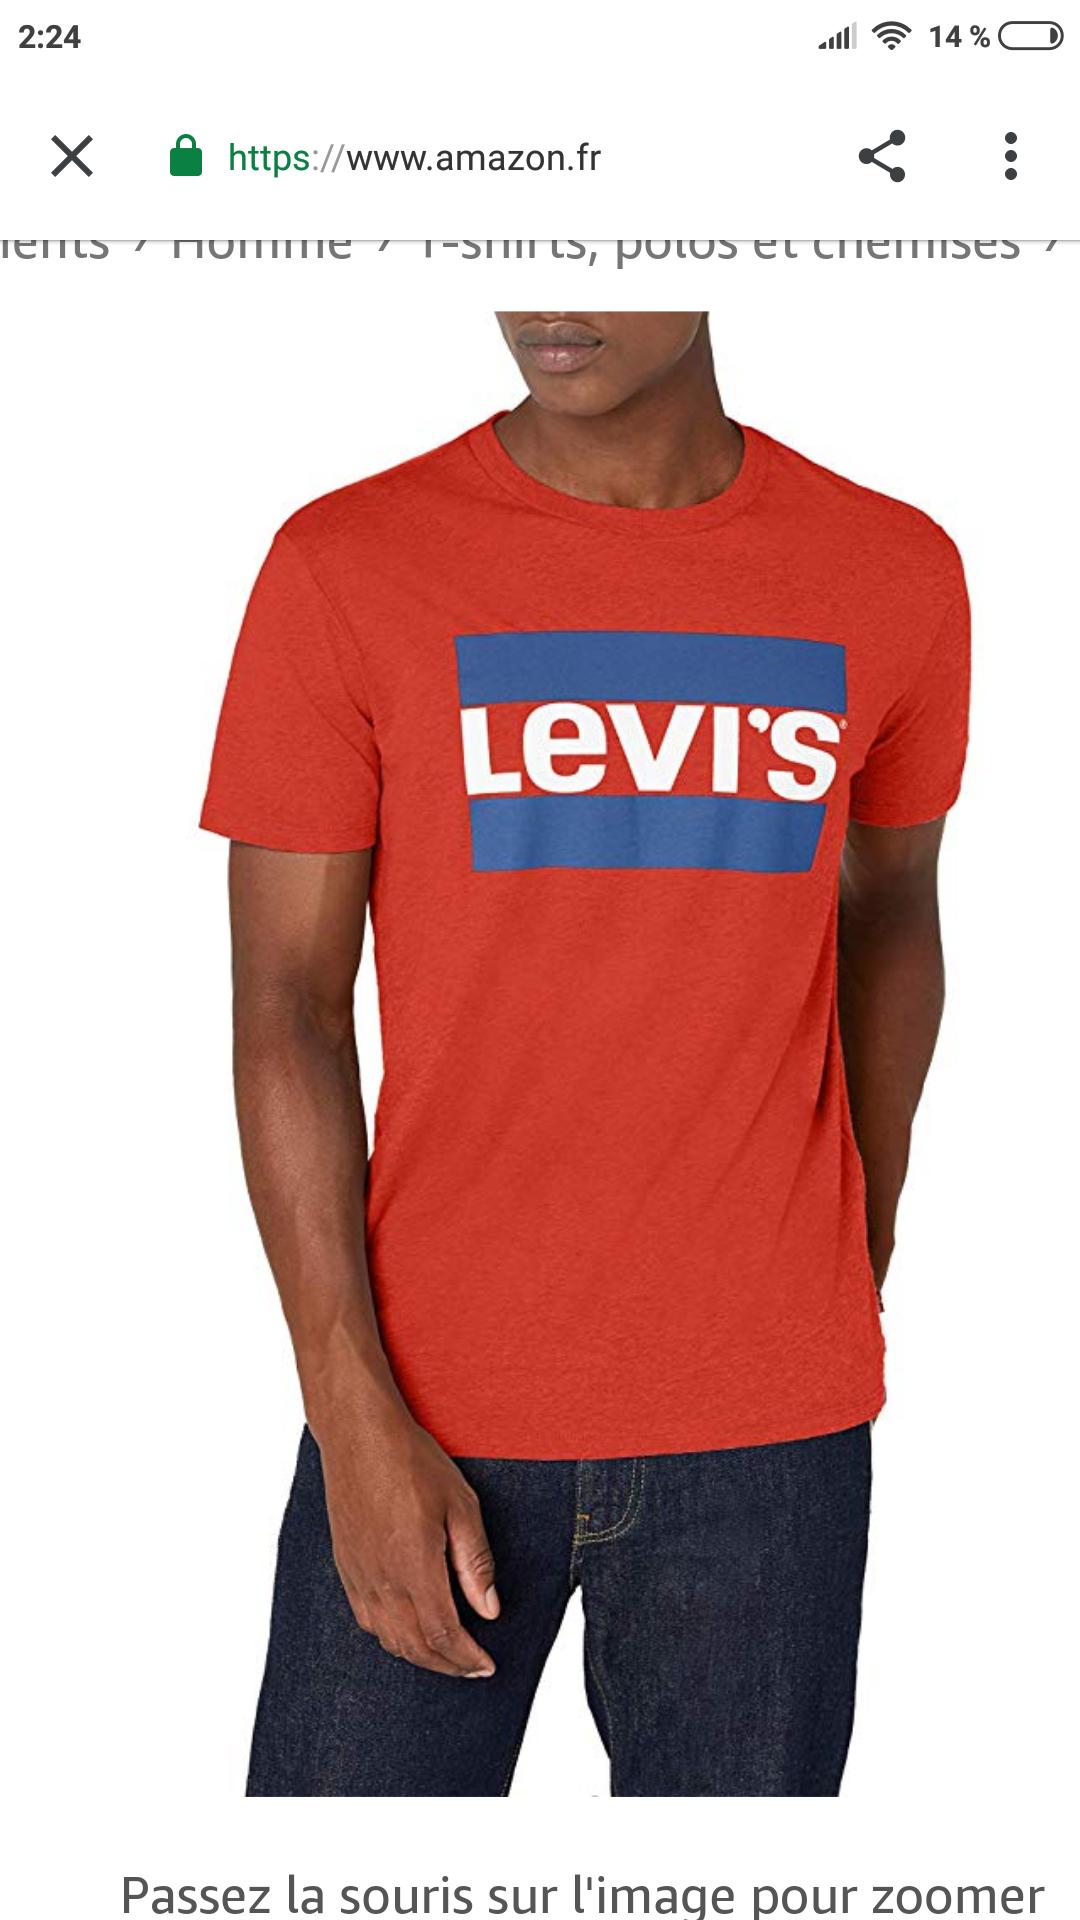 Levi's Sportswear Logo Graphic - Camiseta para Hombre Desde Francia  talla L